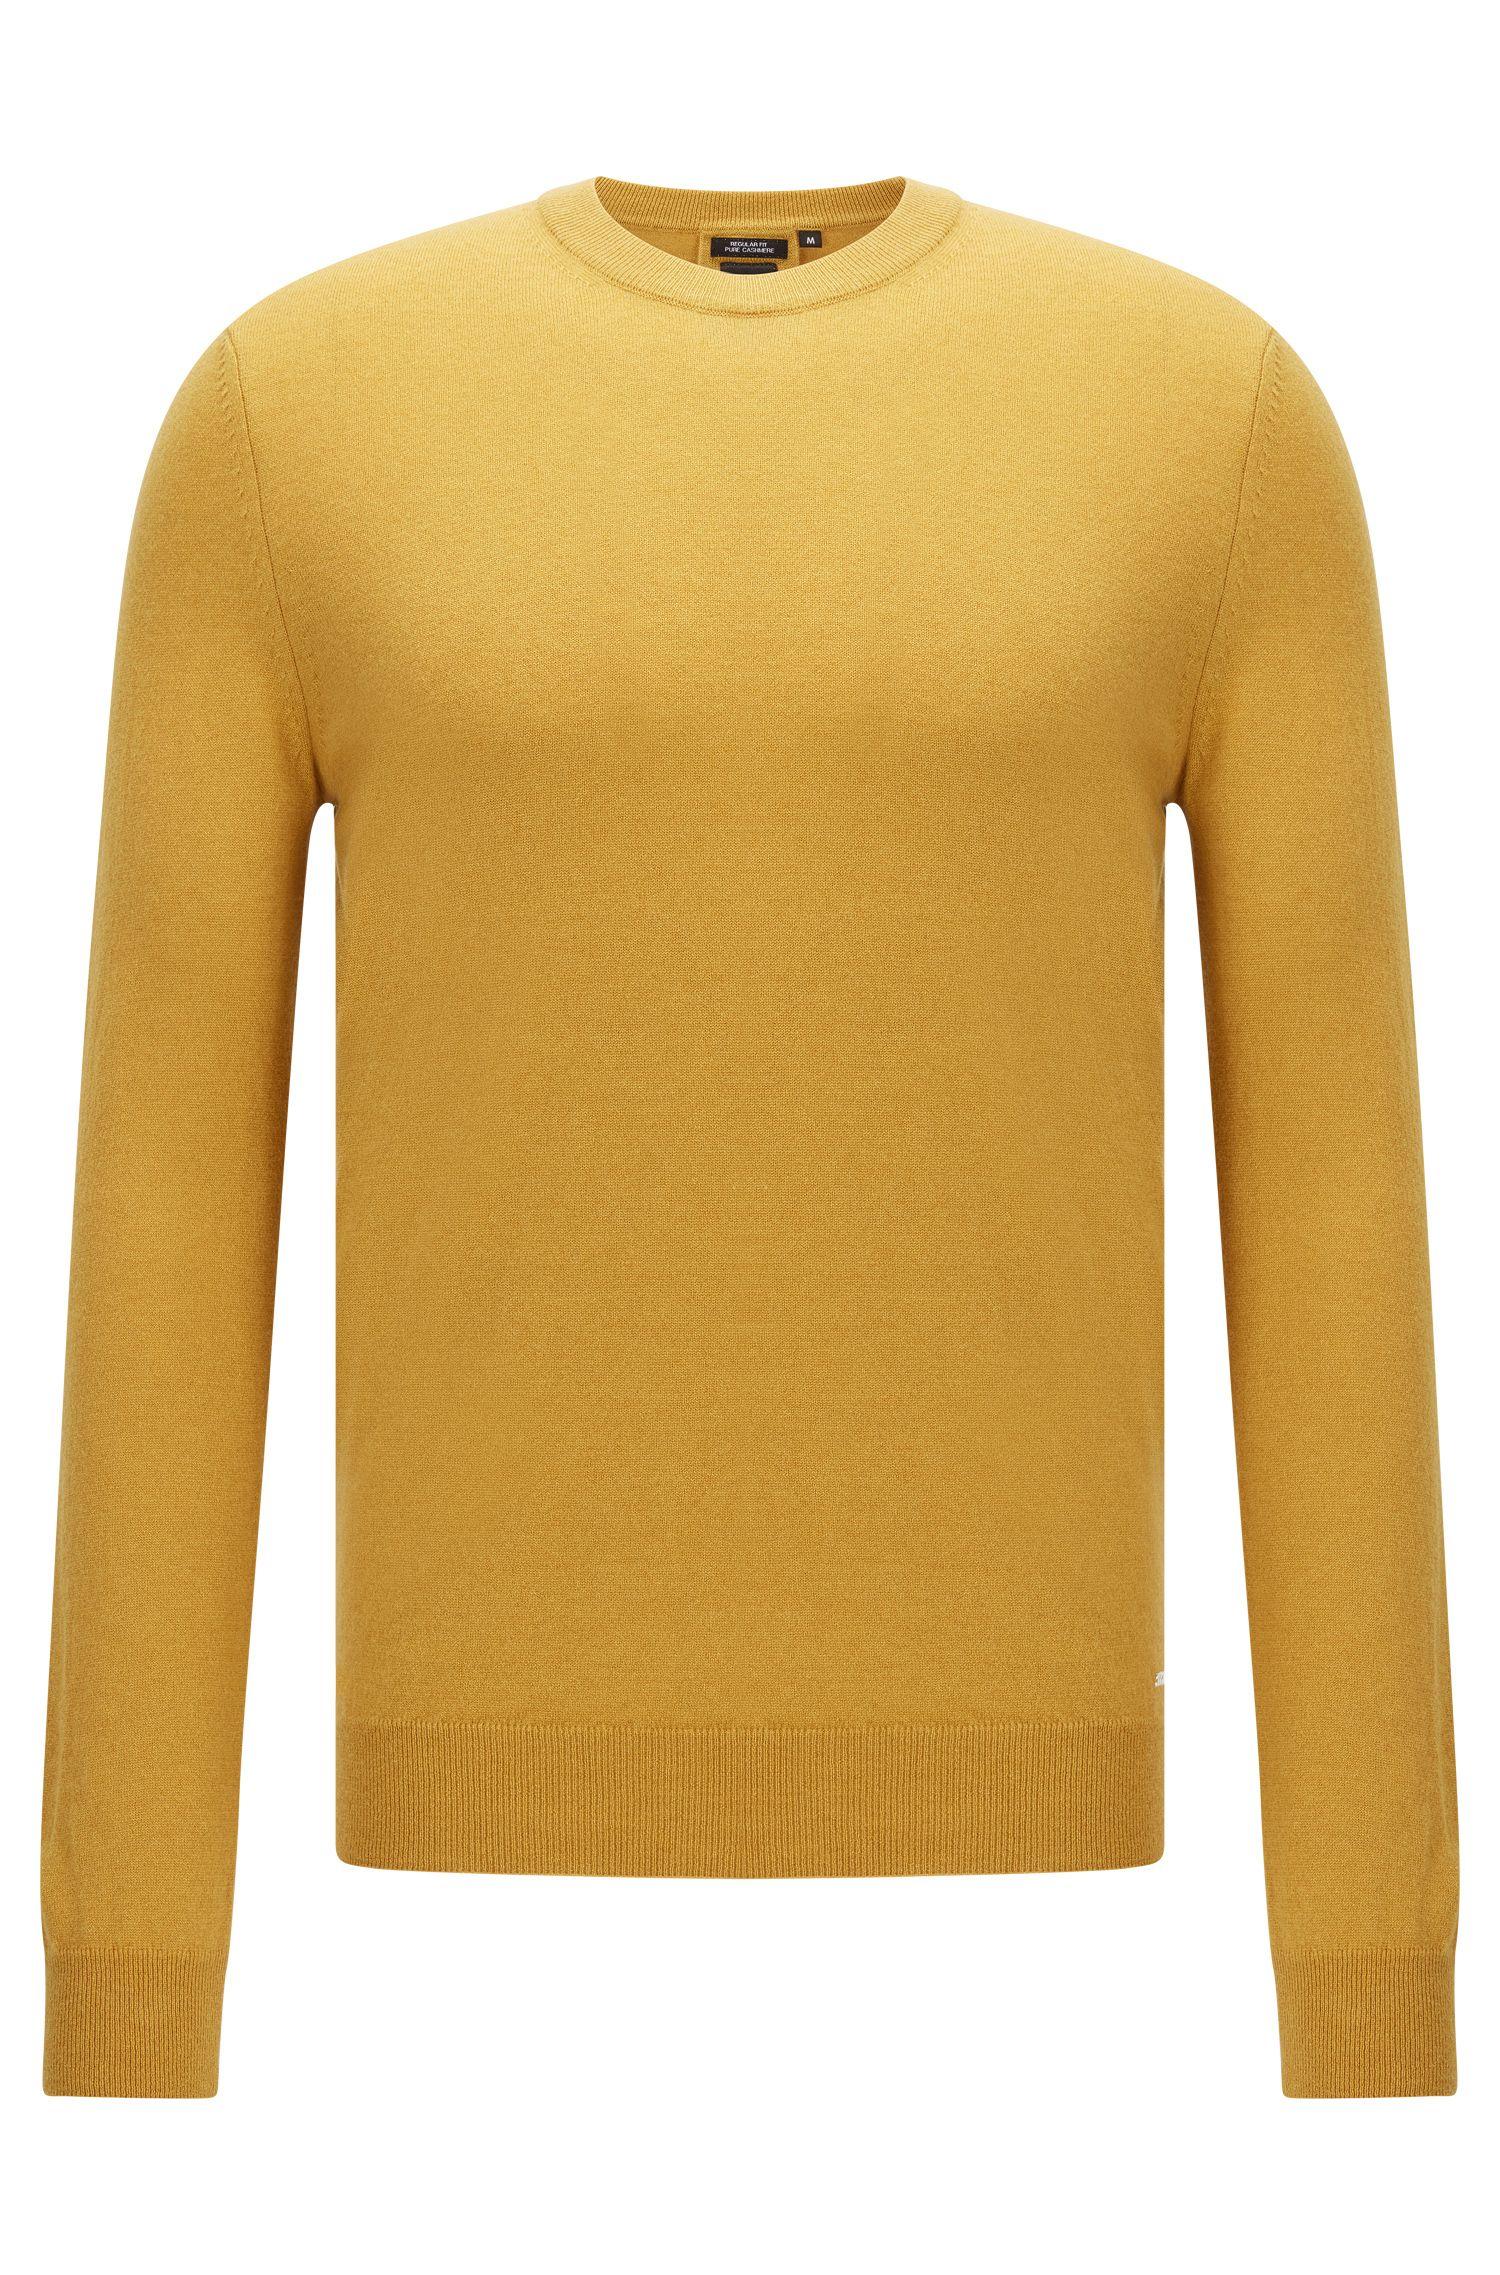 Regular-fit Tailored cashmere sweater: 'T-Borello'